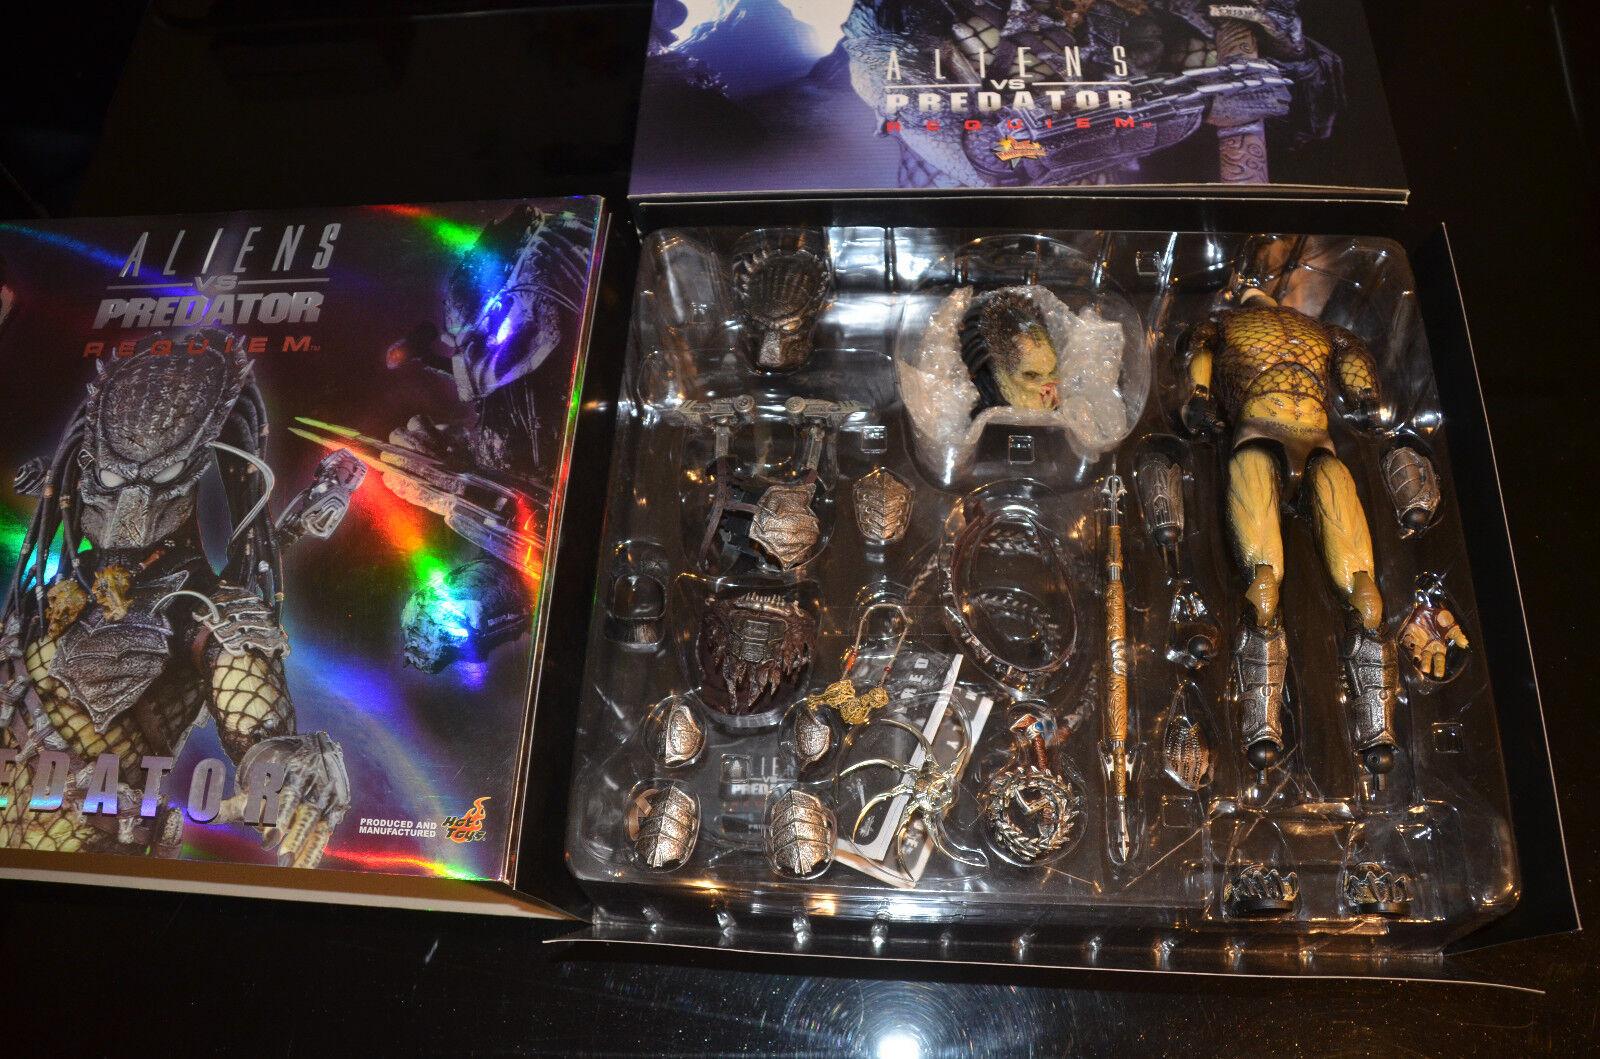 Hot Toys Aliens vs Predator Alien Vs. 16 Predator Requiem